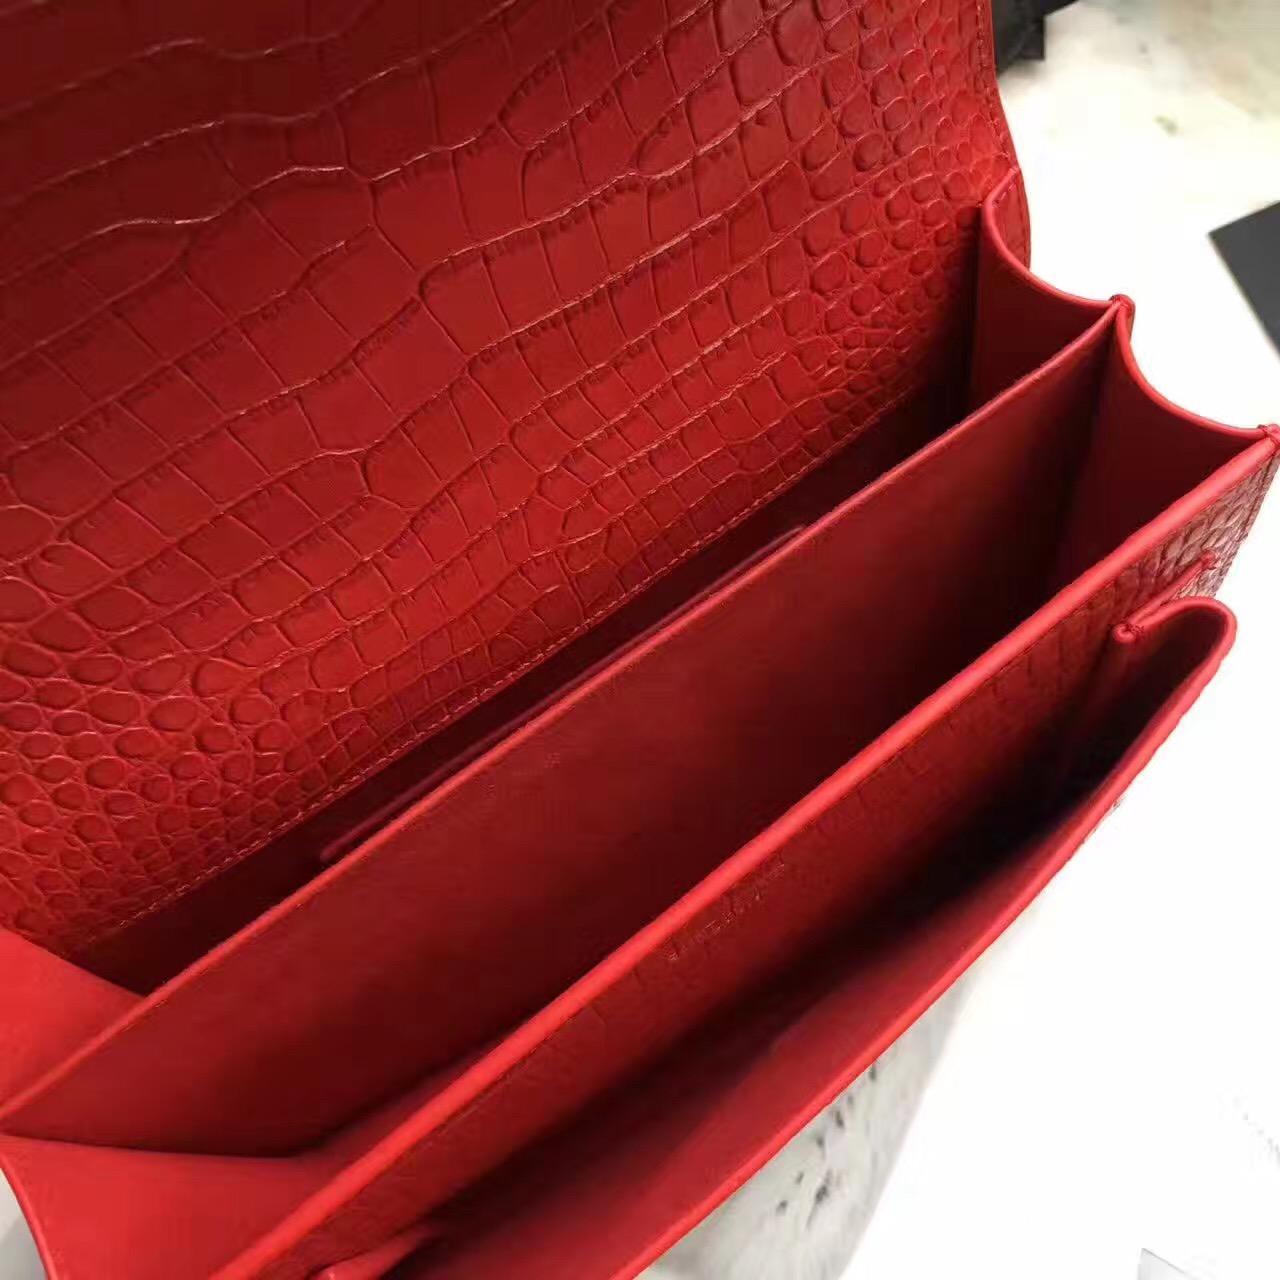 YSL中號SUNSET MONOGRAM SAINT LAURENT红色鱷魚壓紋真皮包